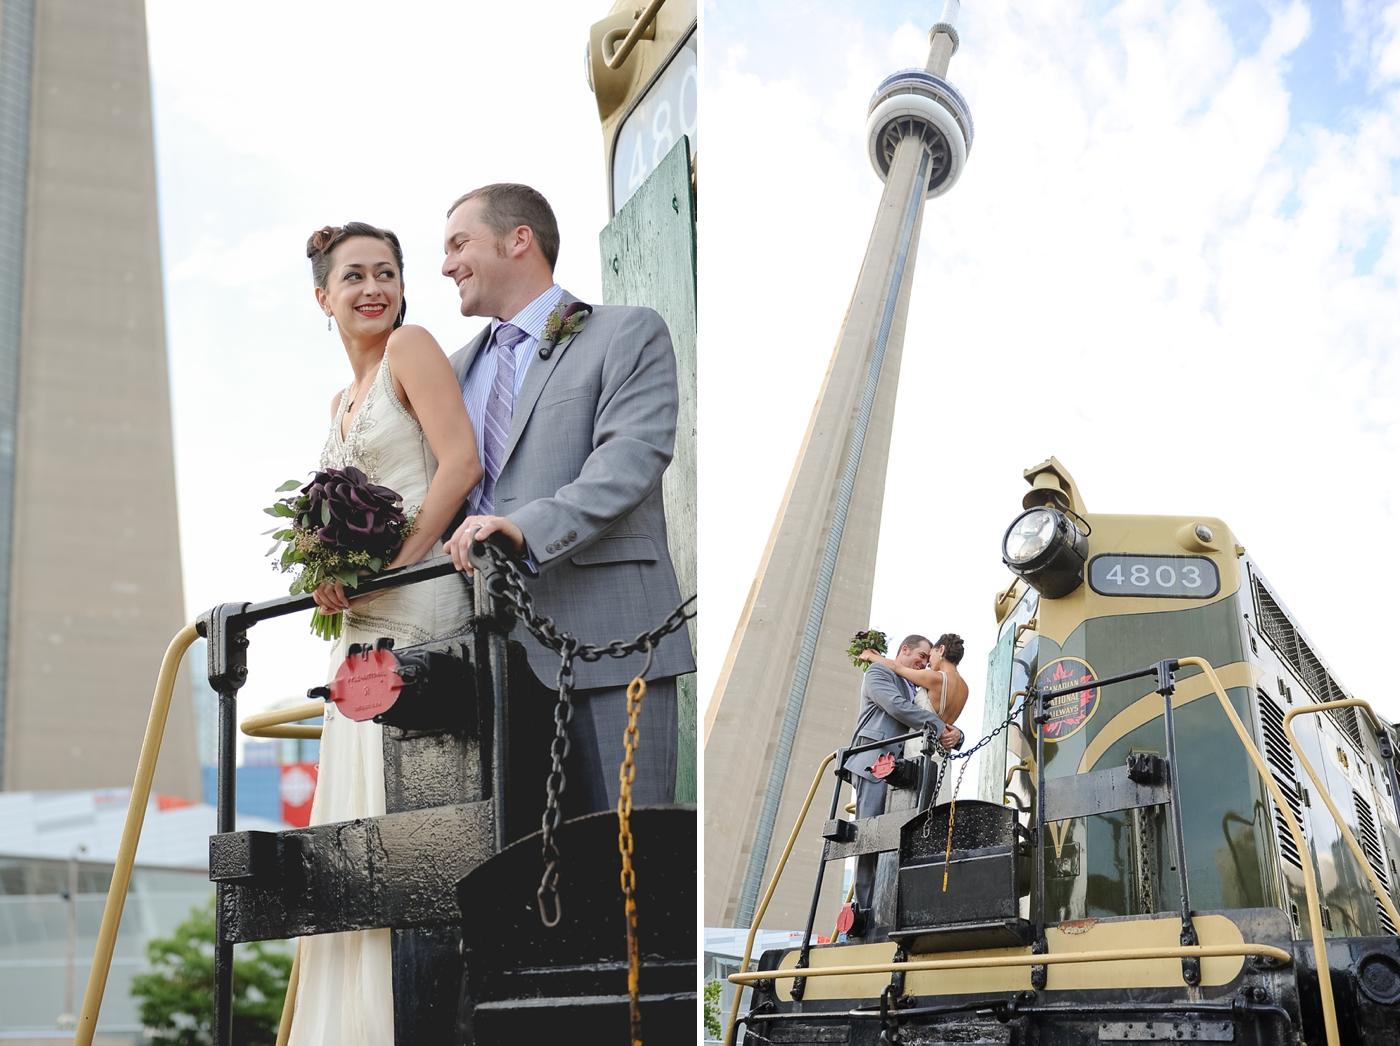 steampunk wedding cn tower wedding photo